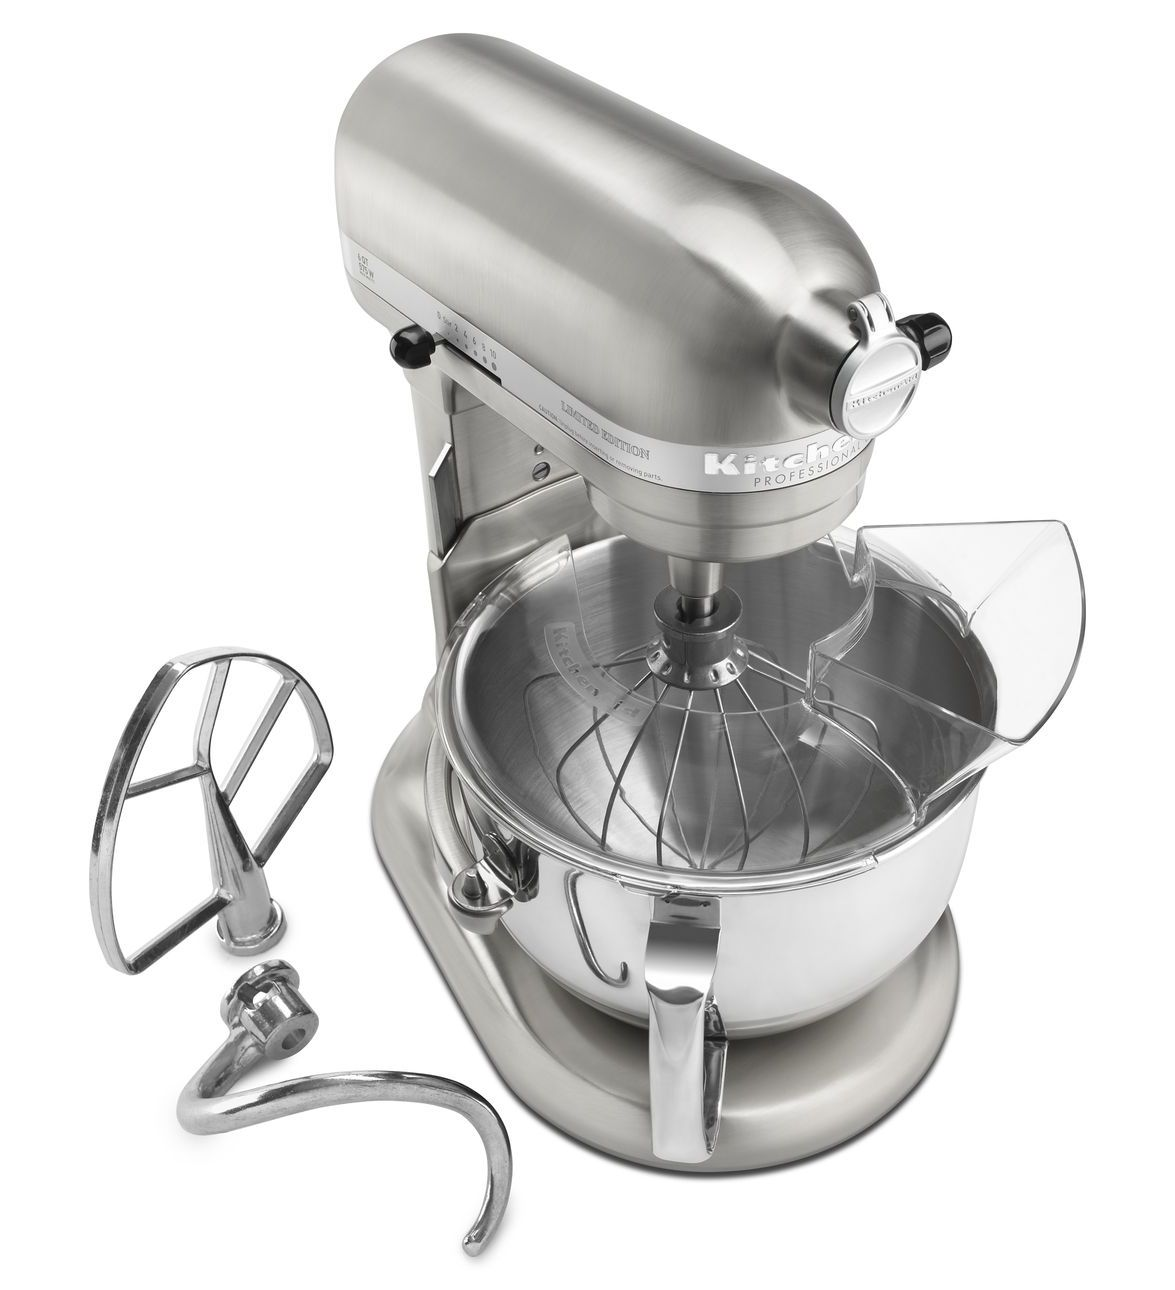 Kitchenaid stand mixer bowl photo - 1